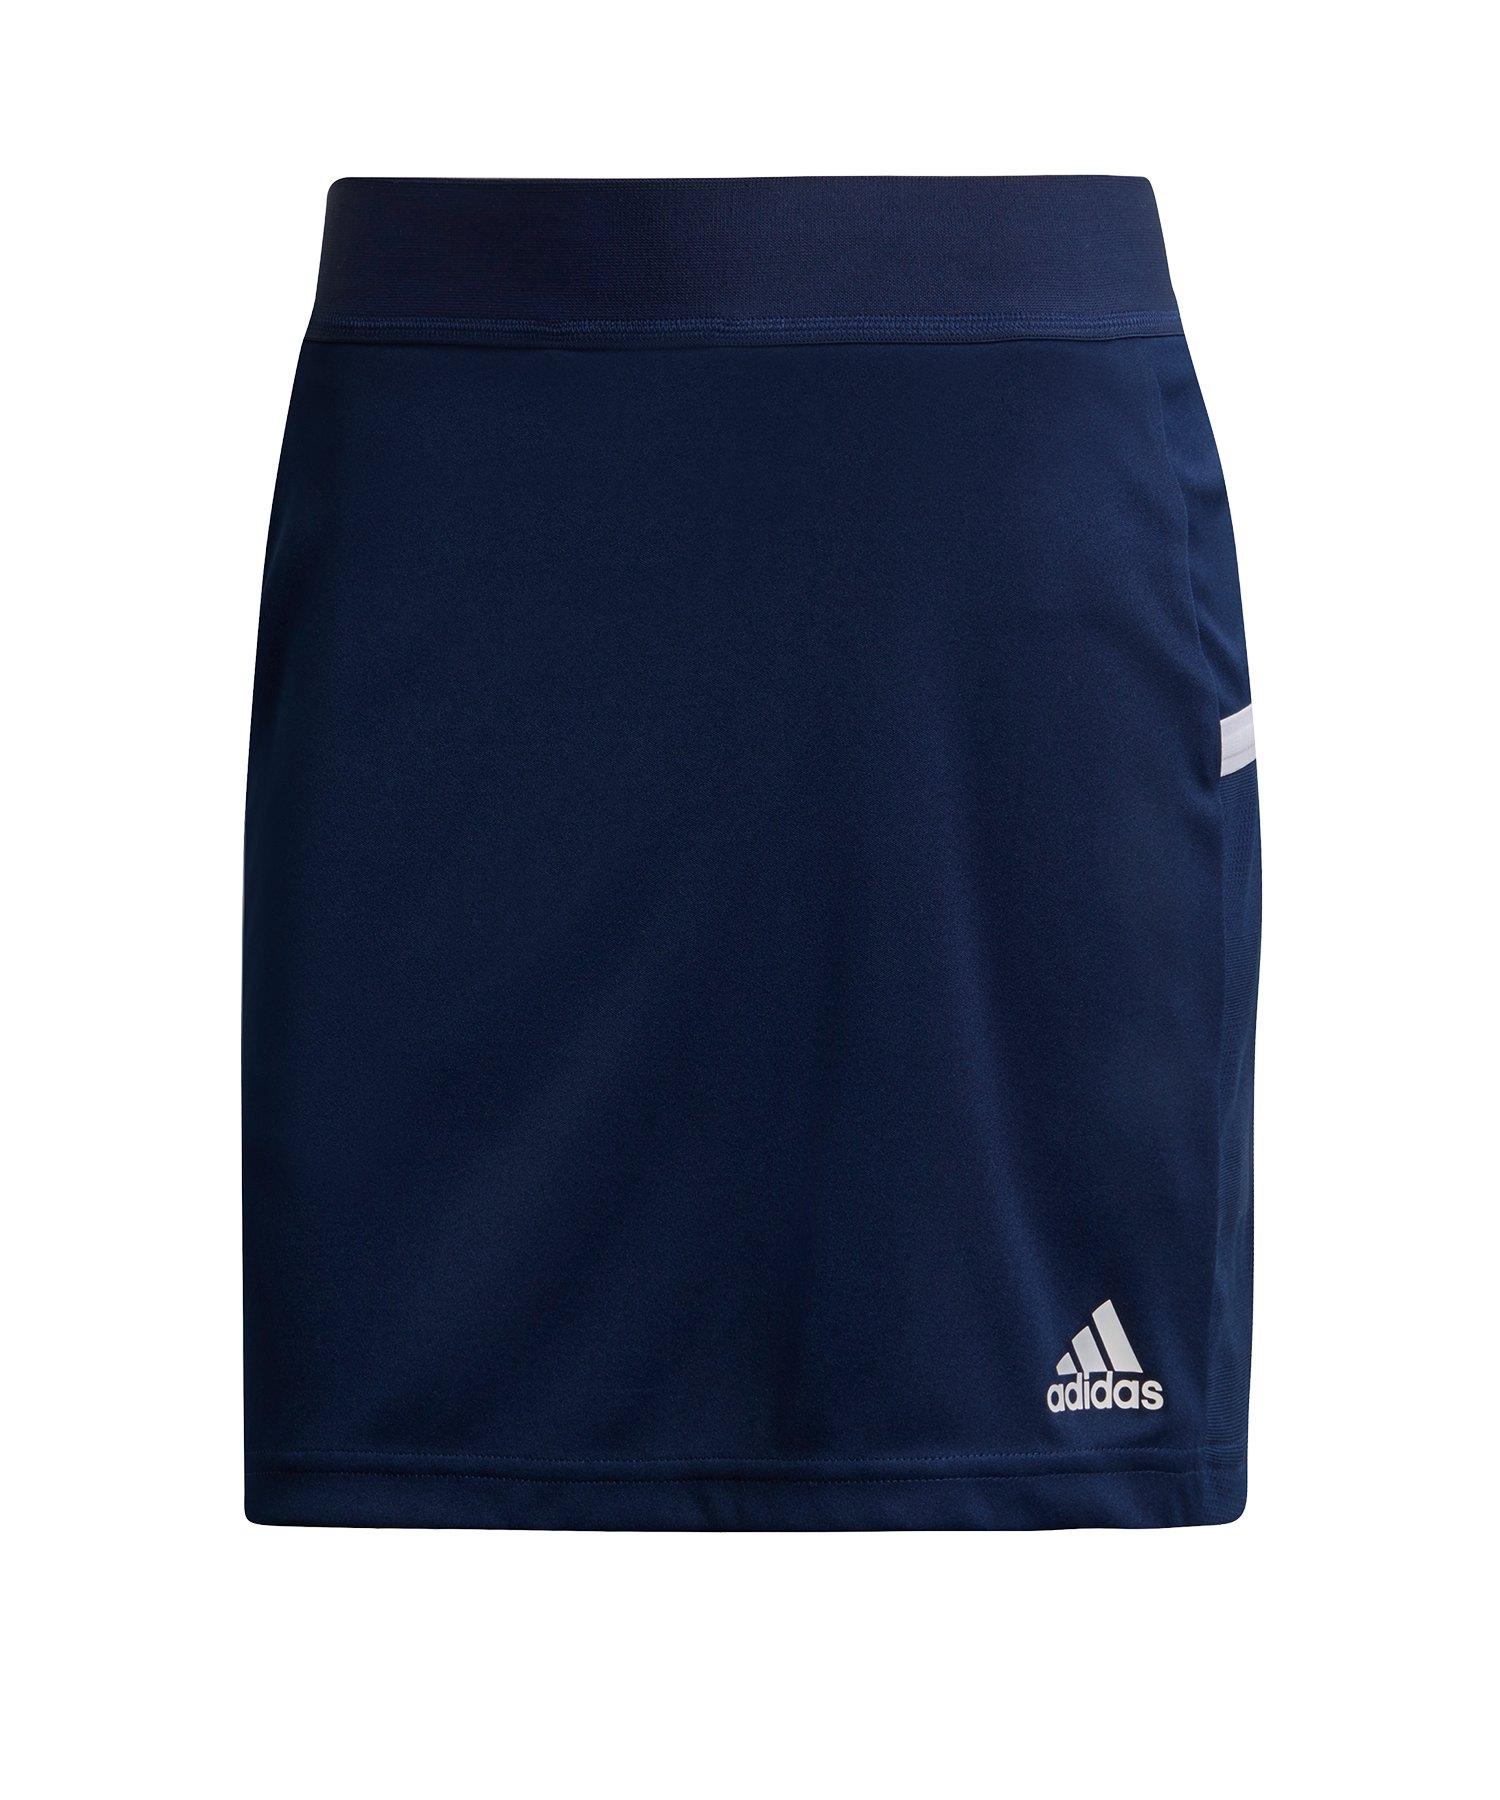 adidas Team 19 Skirt Rock Damen Blau Weiss - blau